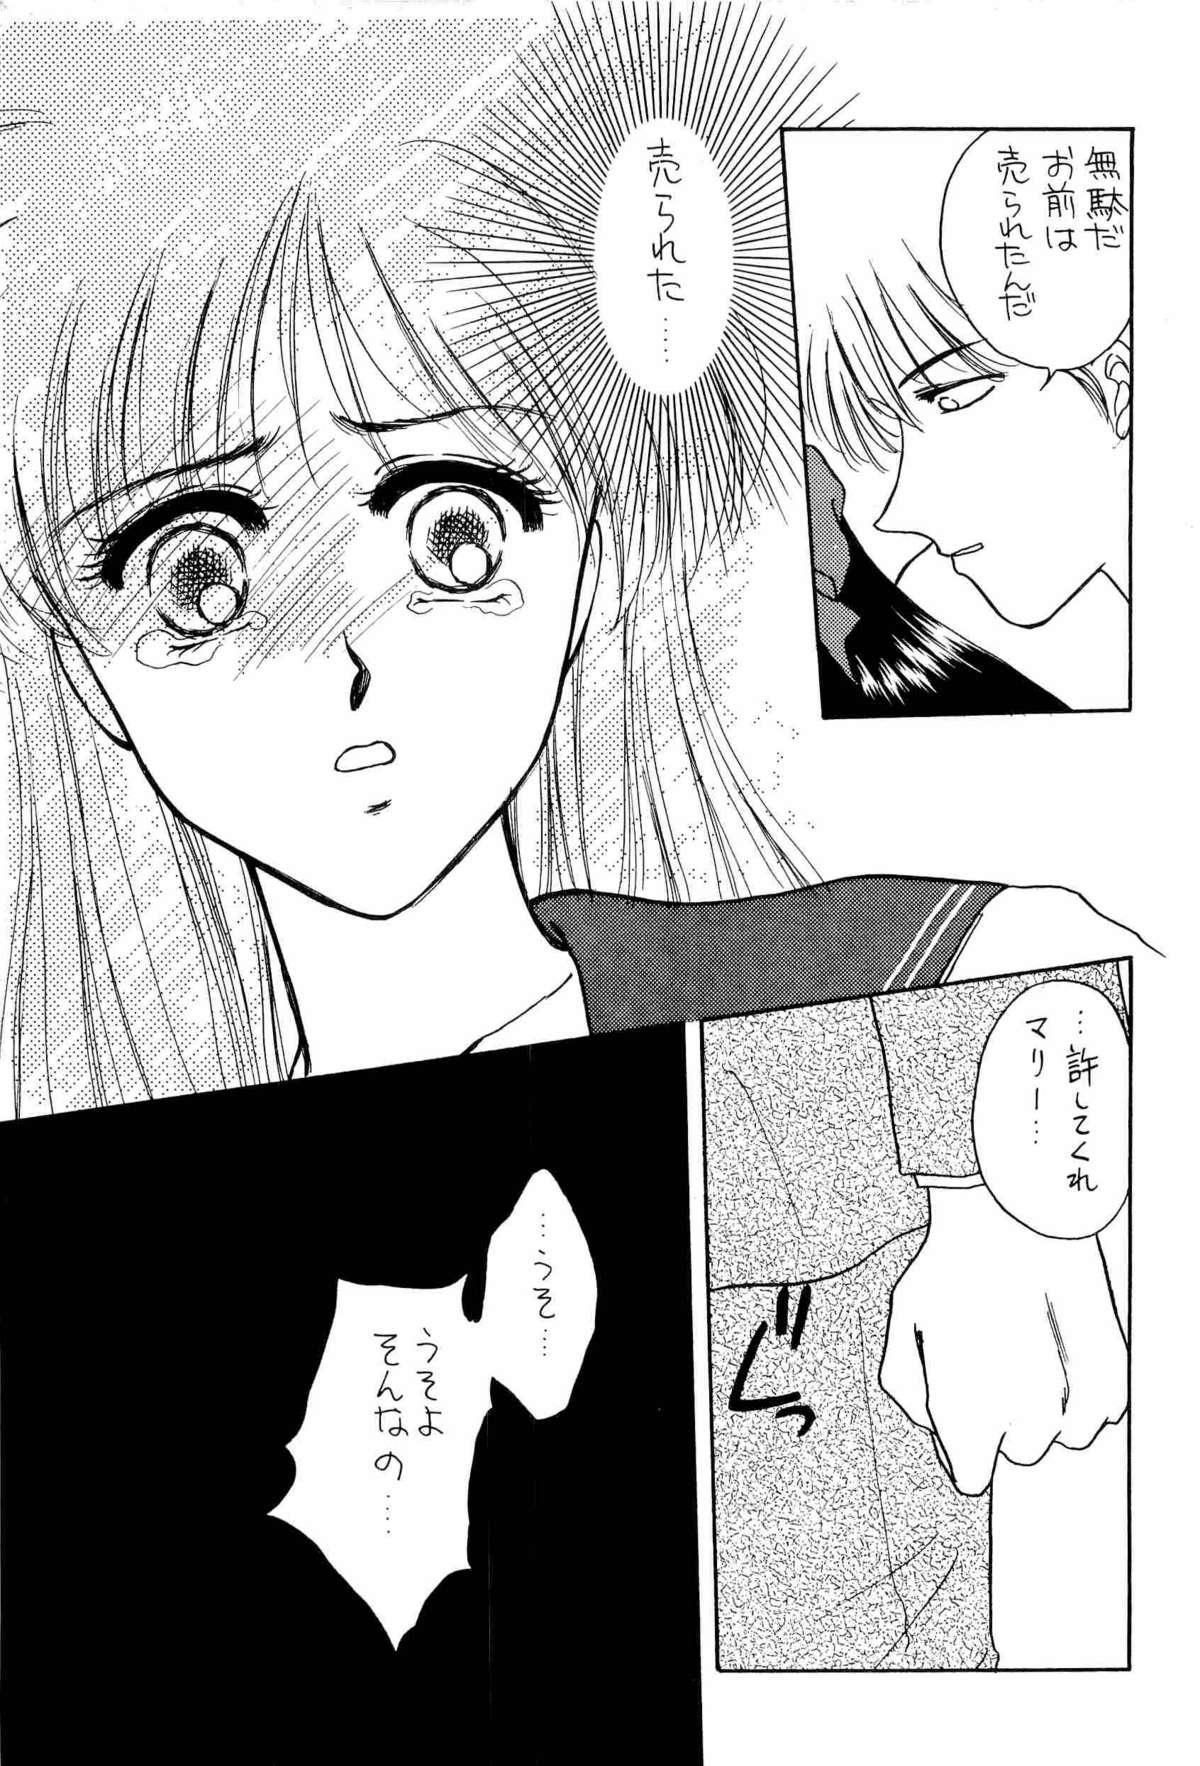 Bisyoujo Anthology '93 jyoukan 72